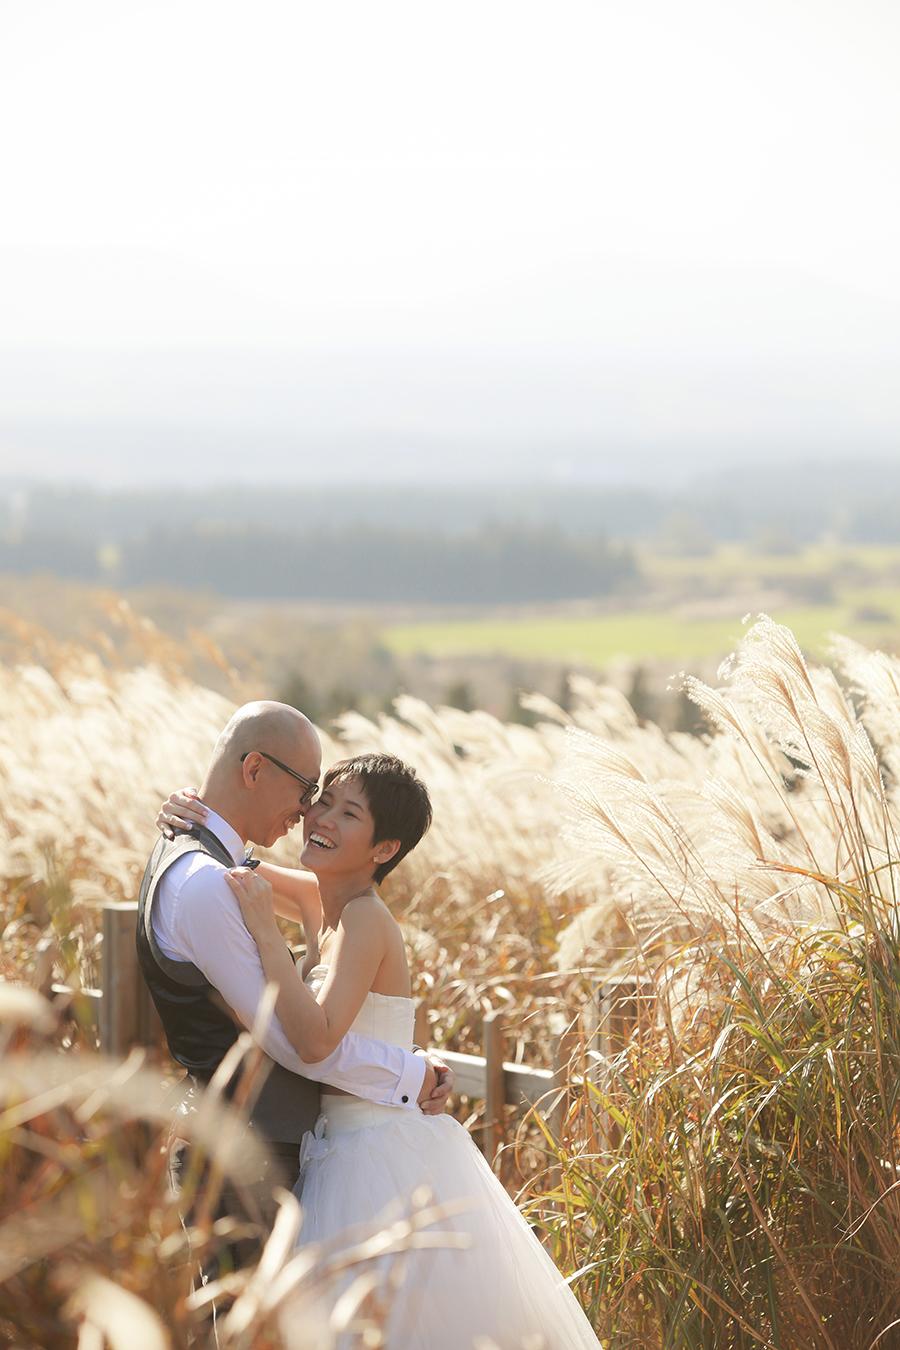 seoul jeju korea . wedding photography by kurt ahs . steve+chloe . 8045.jpg